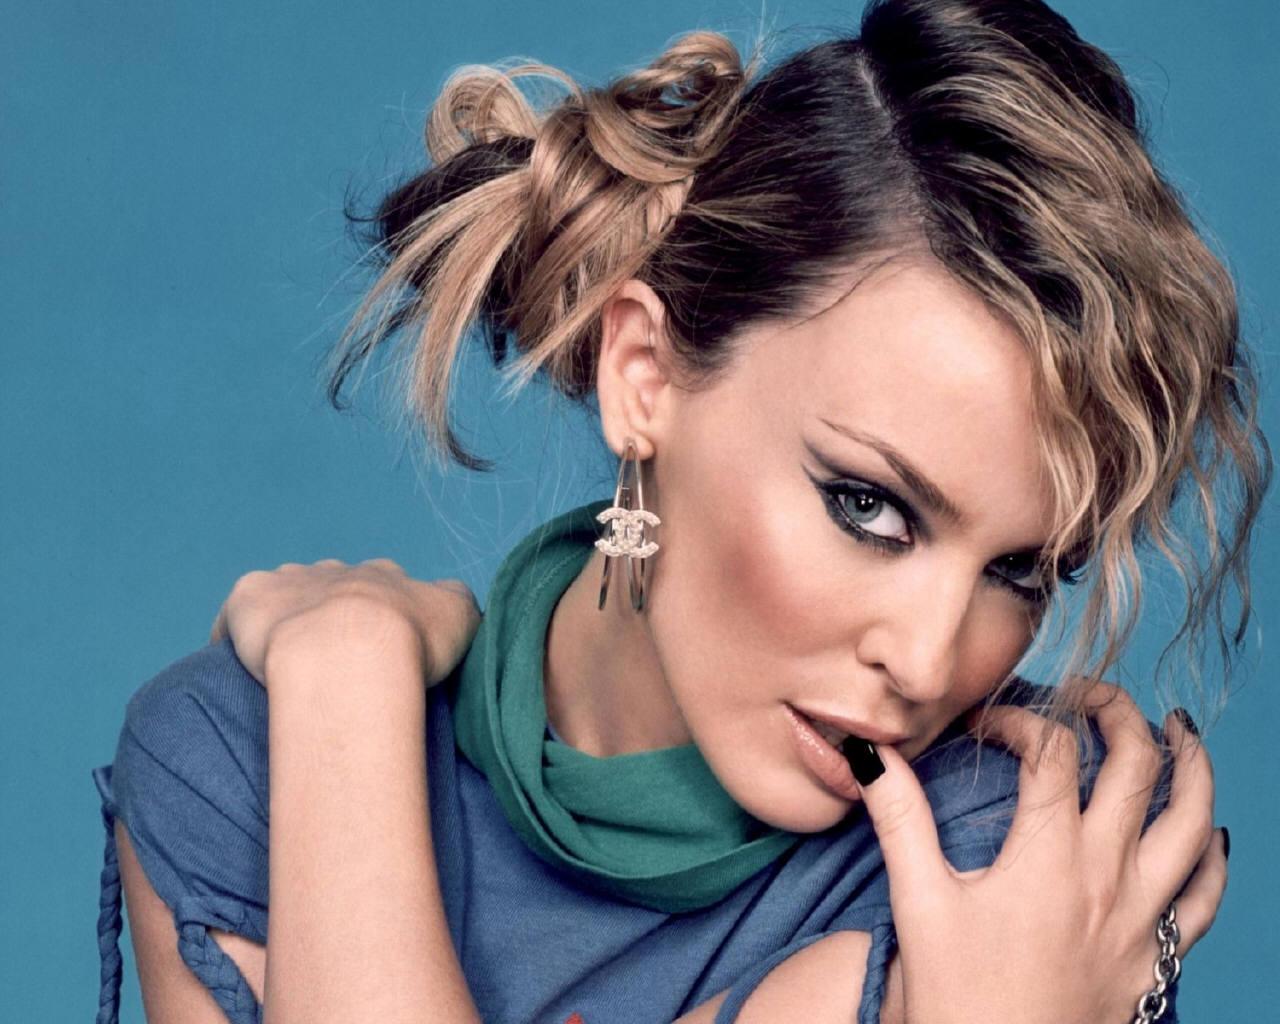 http://3.bp.blogspot.com/_-nHFKOgXVAc/TKM7Sz114tI/AAAAAAAAAs8/tNt_fMNlN6w/s1600/Kylie-Minogue-kylie-minogue-64557_1280_1024.jpg